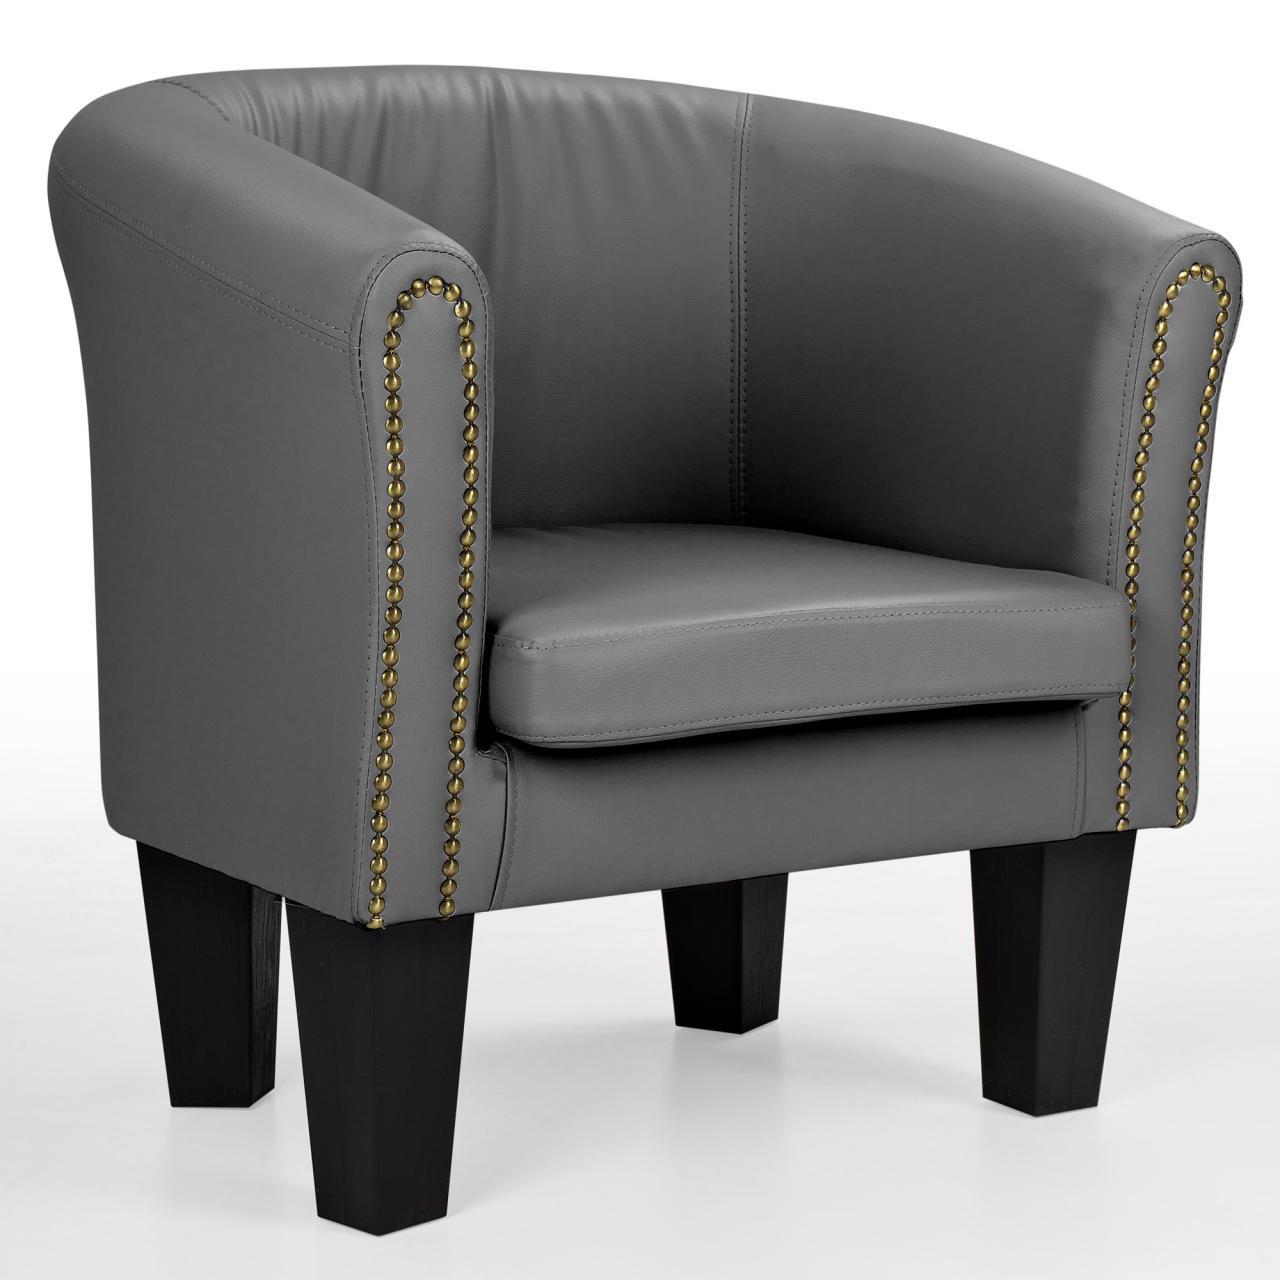 Sessel Lounge Chesterfield Polster Möbel HOMELUX Sessel